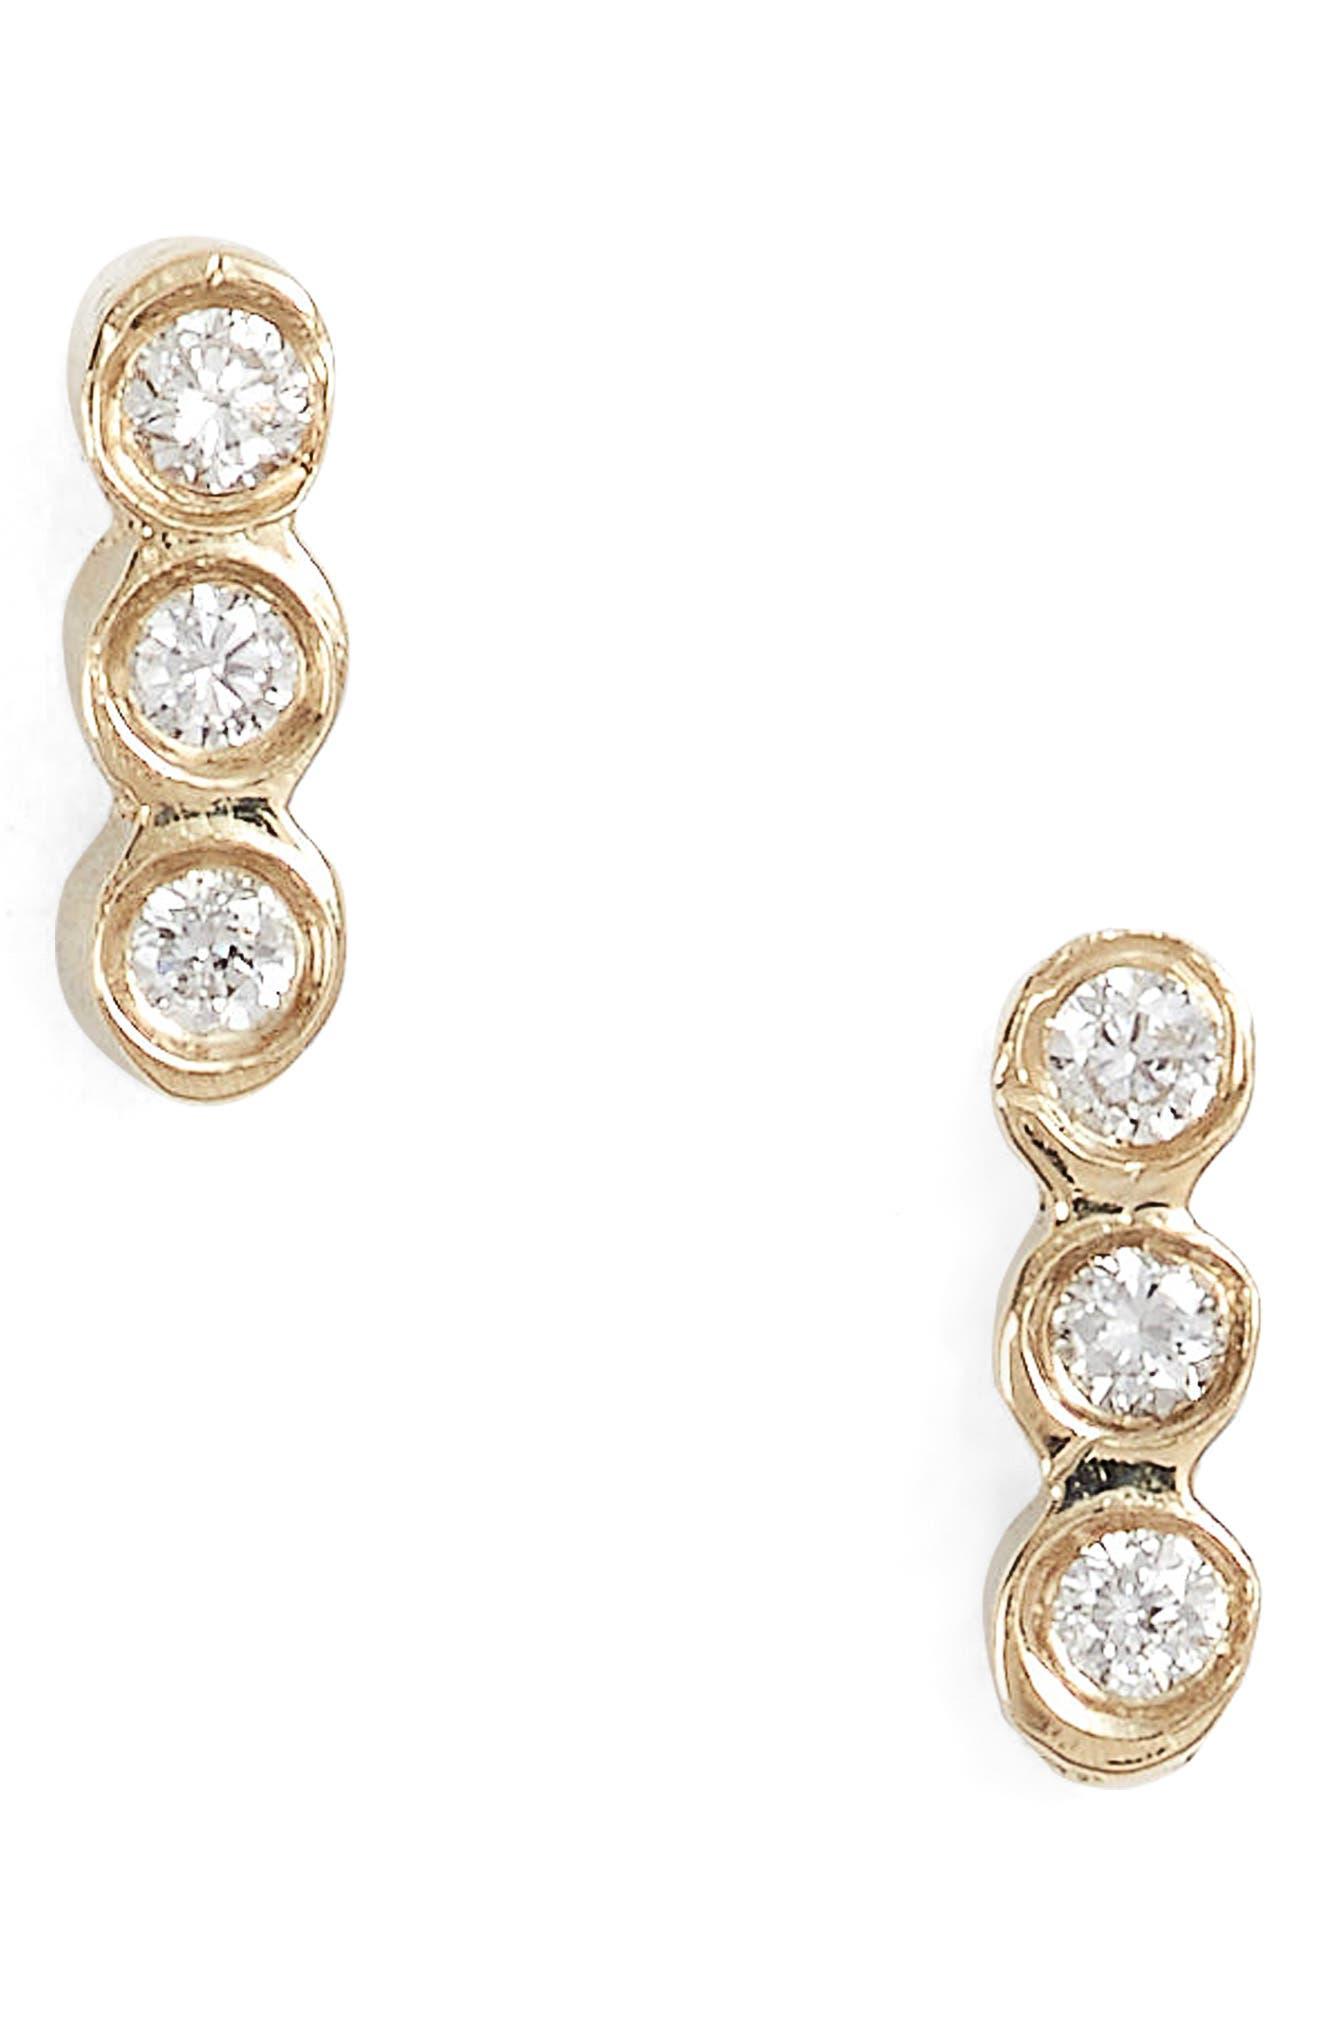 Zoë Chicco Diamond Bezel Bar Stud Earrings